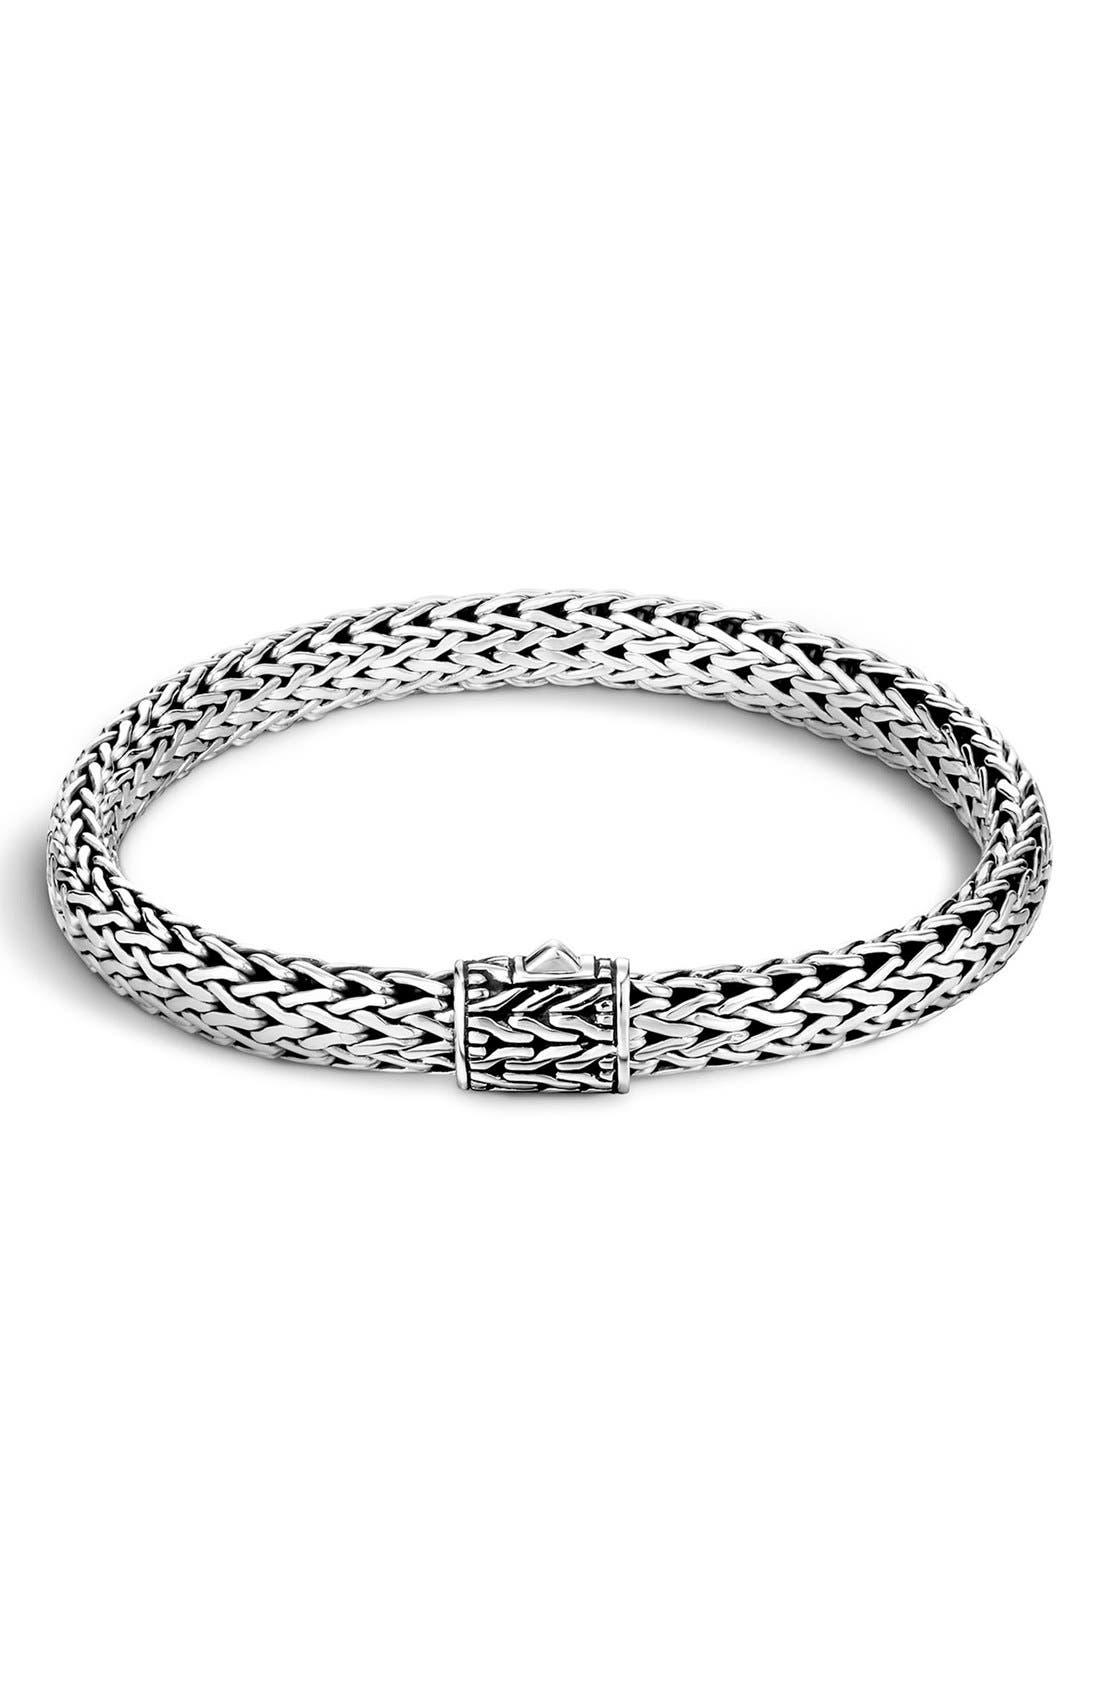 Alternate Image 1 Selected - John Hardy 'Classic Chain' Small Bracelet